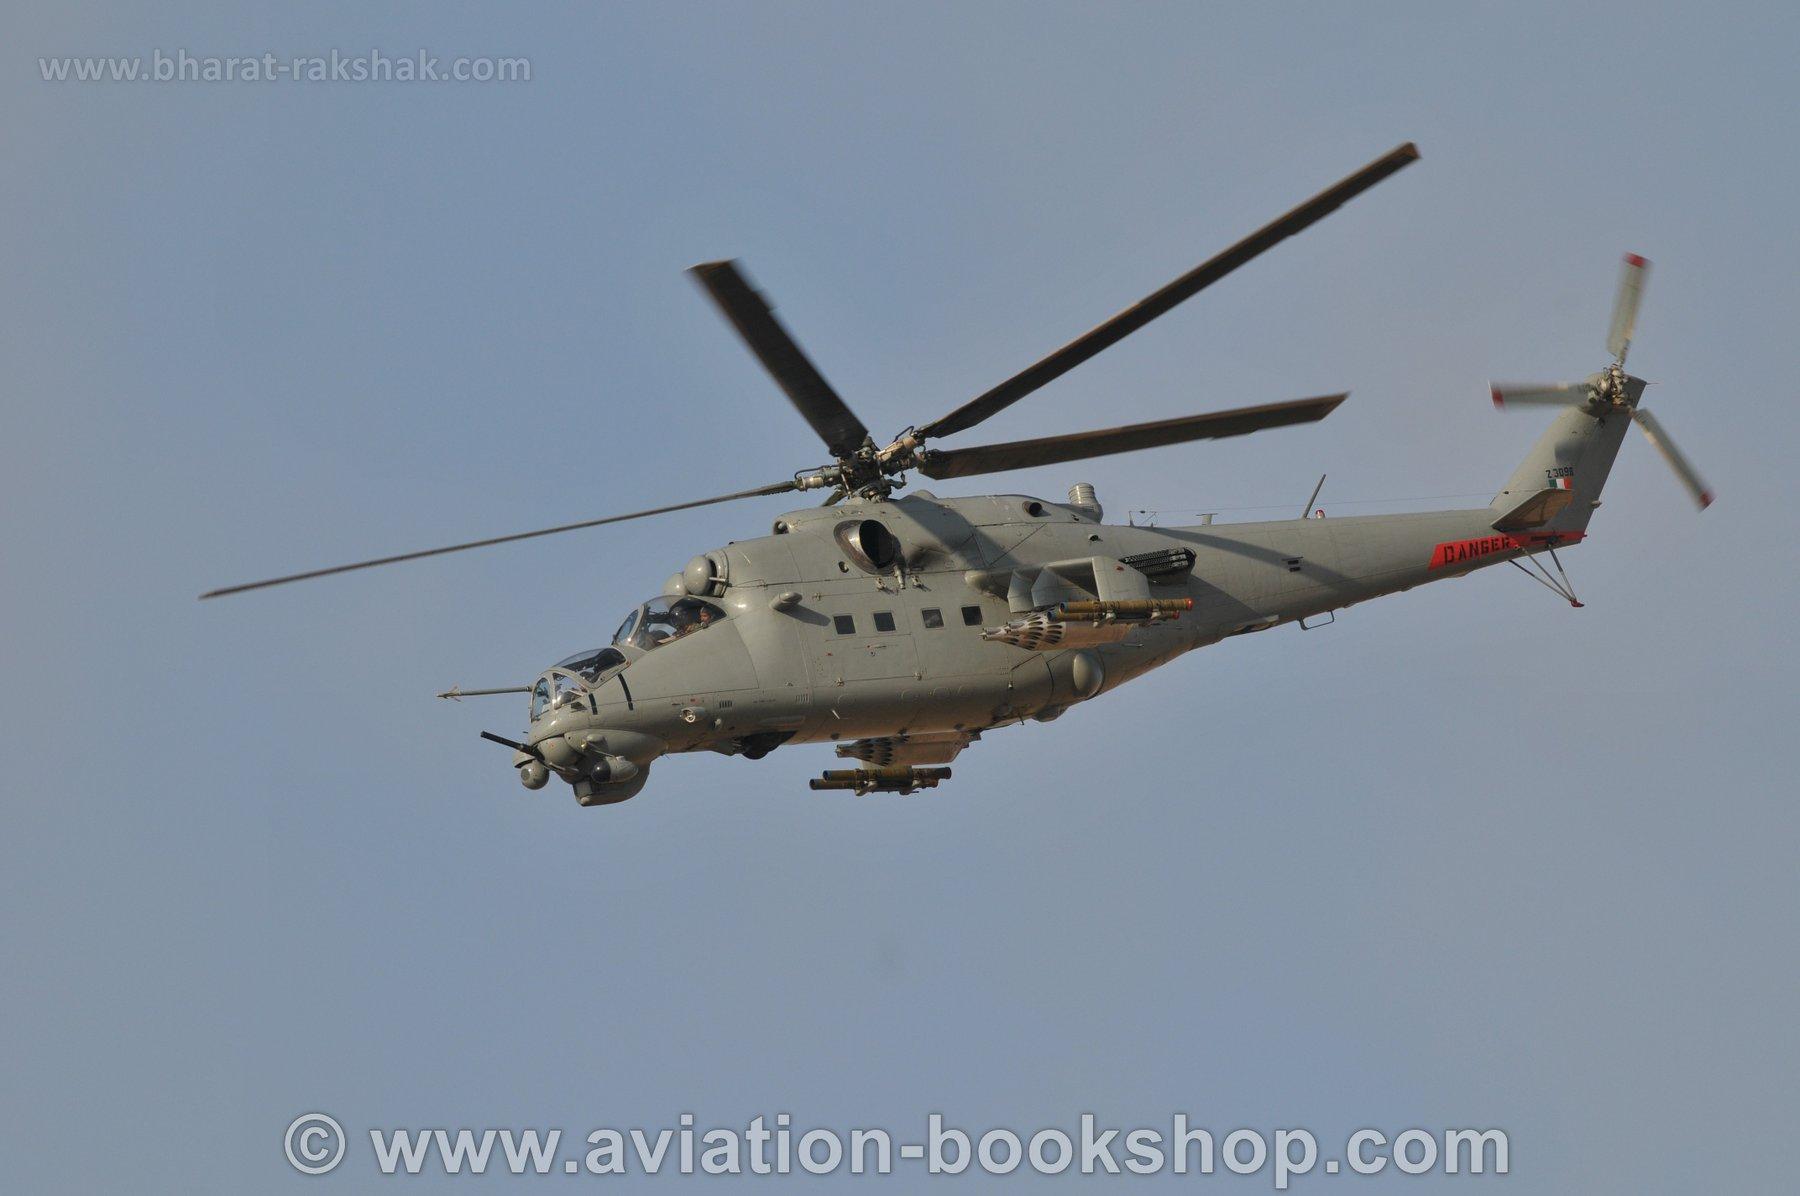 http://www.bharat-rakshak.com/IAF/Galleries/30301-1/Mi35_Z3098.jpg